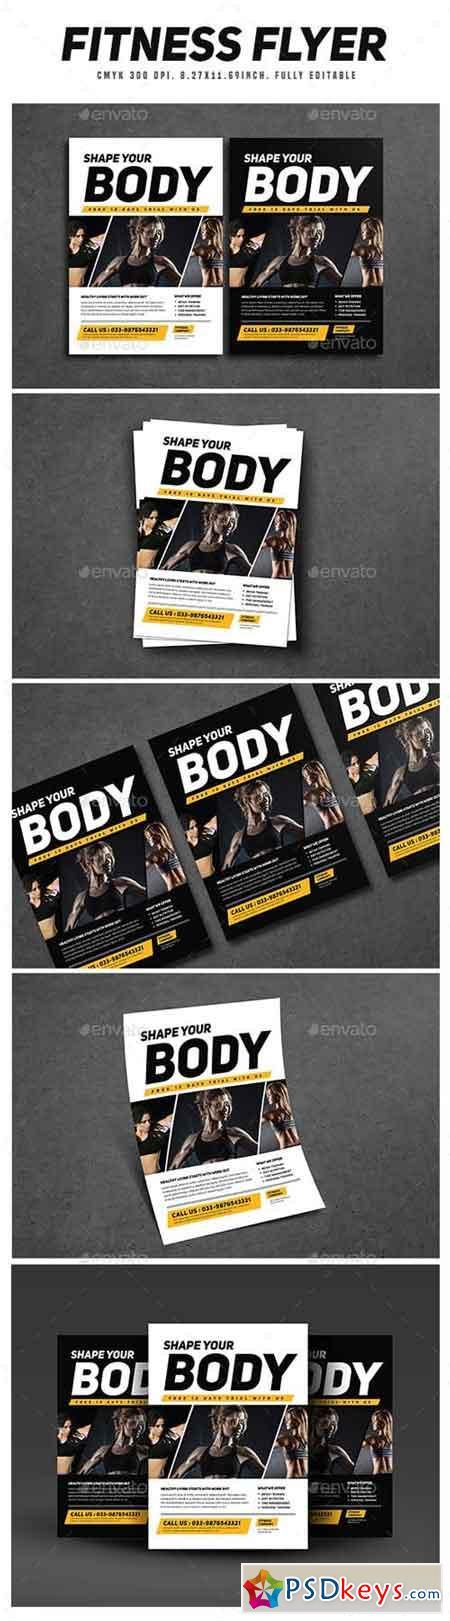 Fitness Flyer 16538520